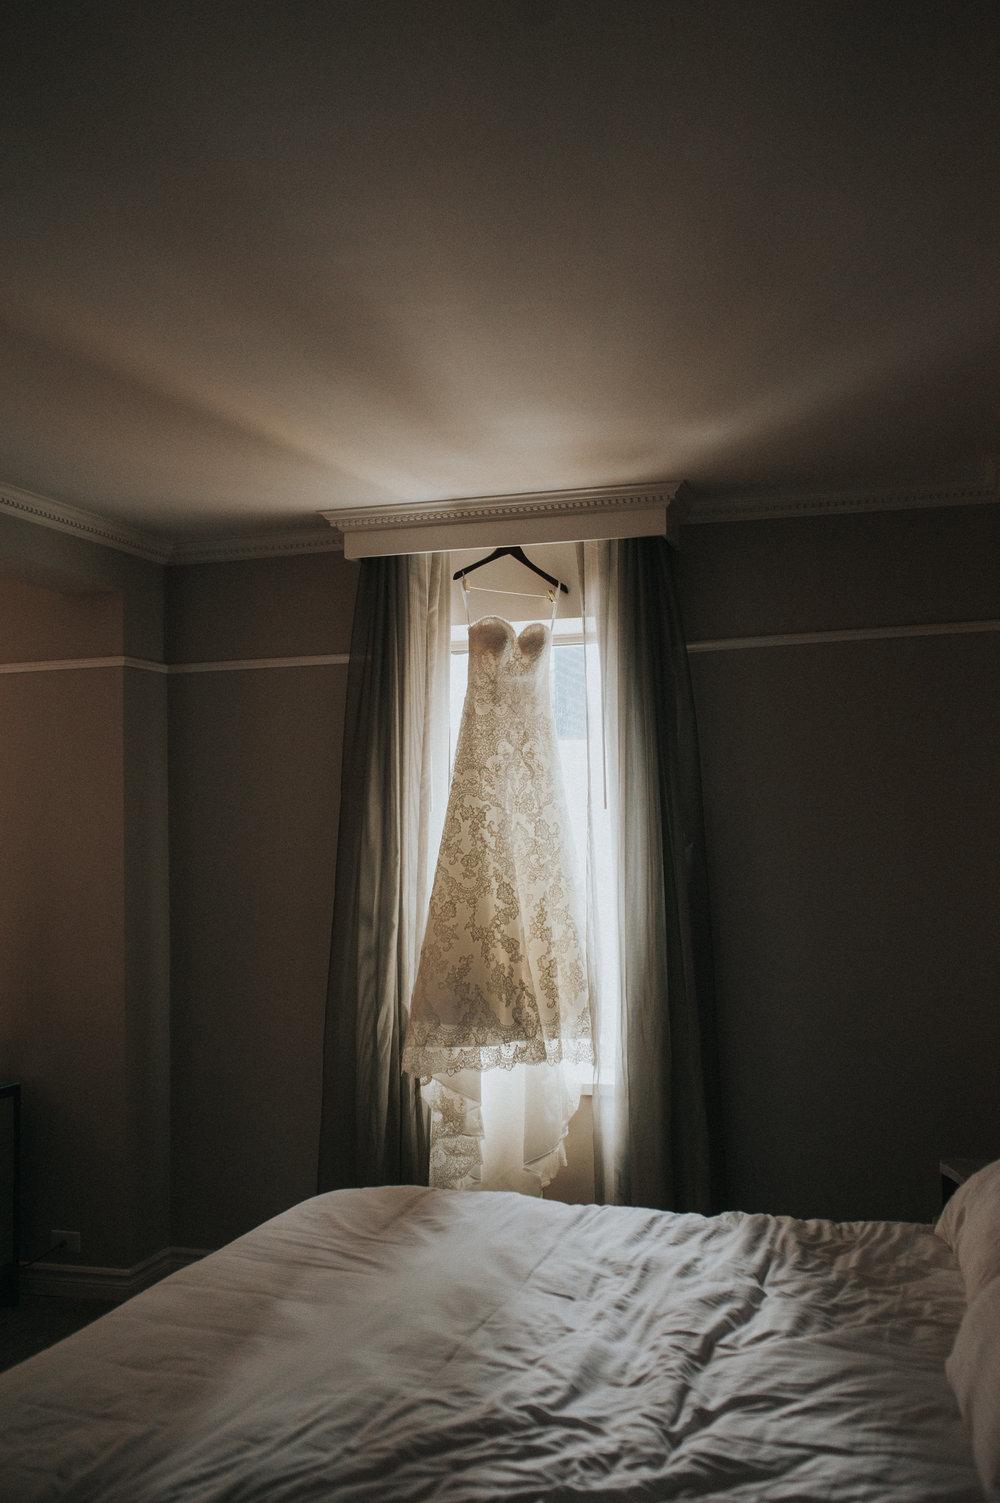 bride-wedding-dress-in-window-toronto-same-sex-wedding-willow-and-birch-photography-documentary-wedding-photographers.jpg